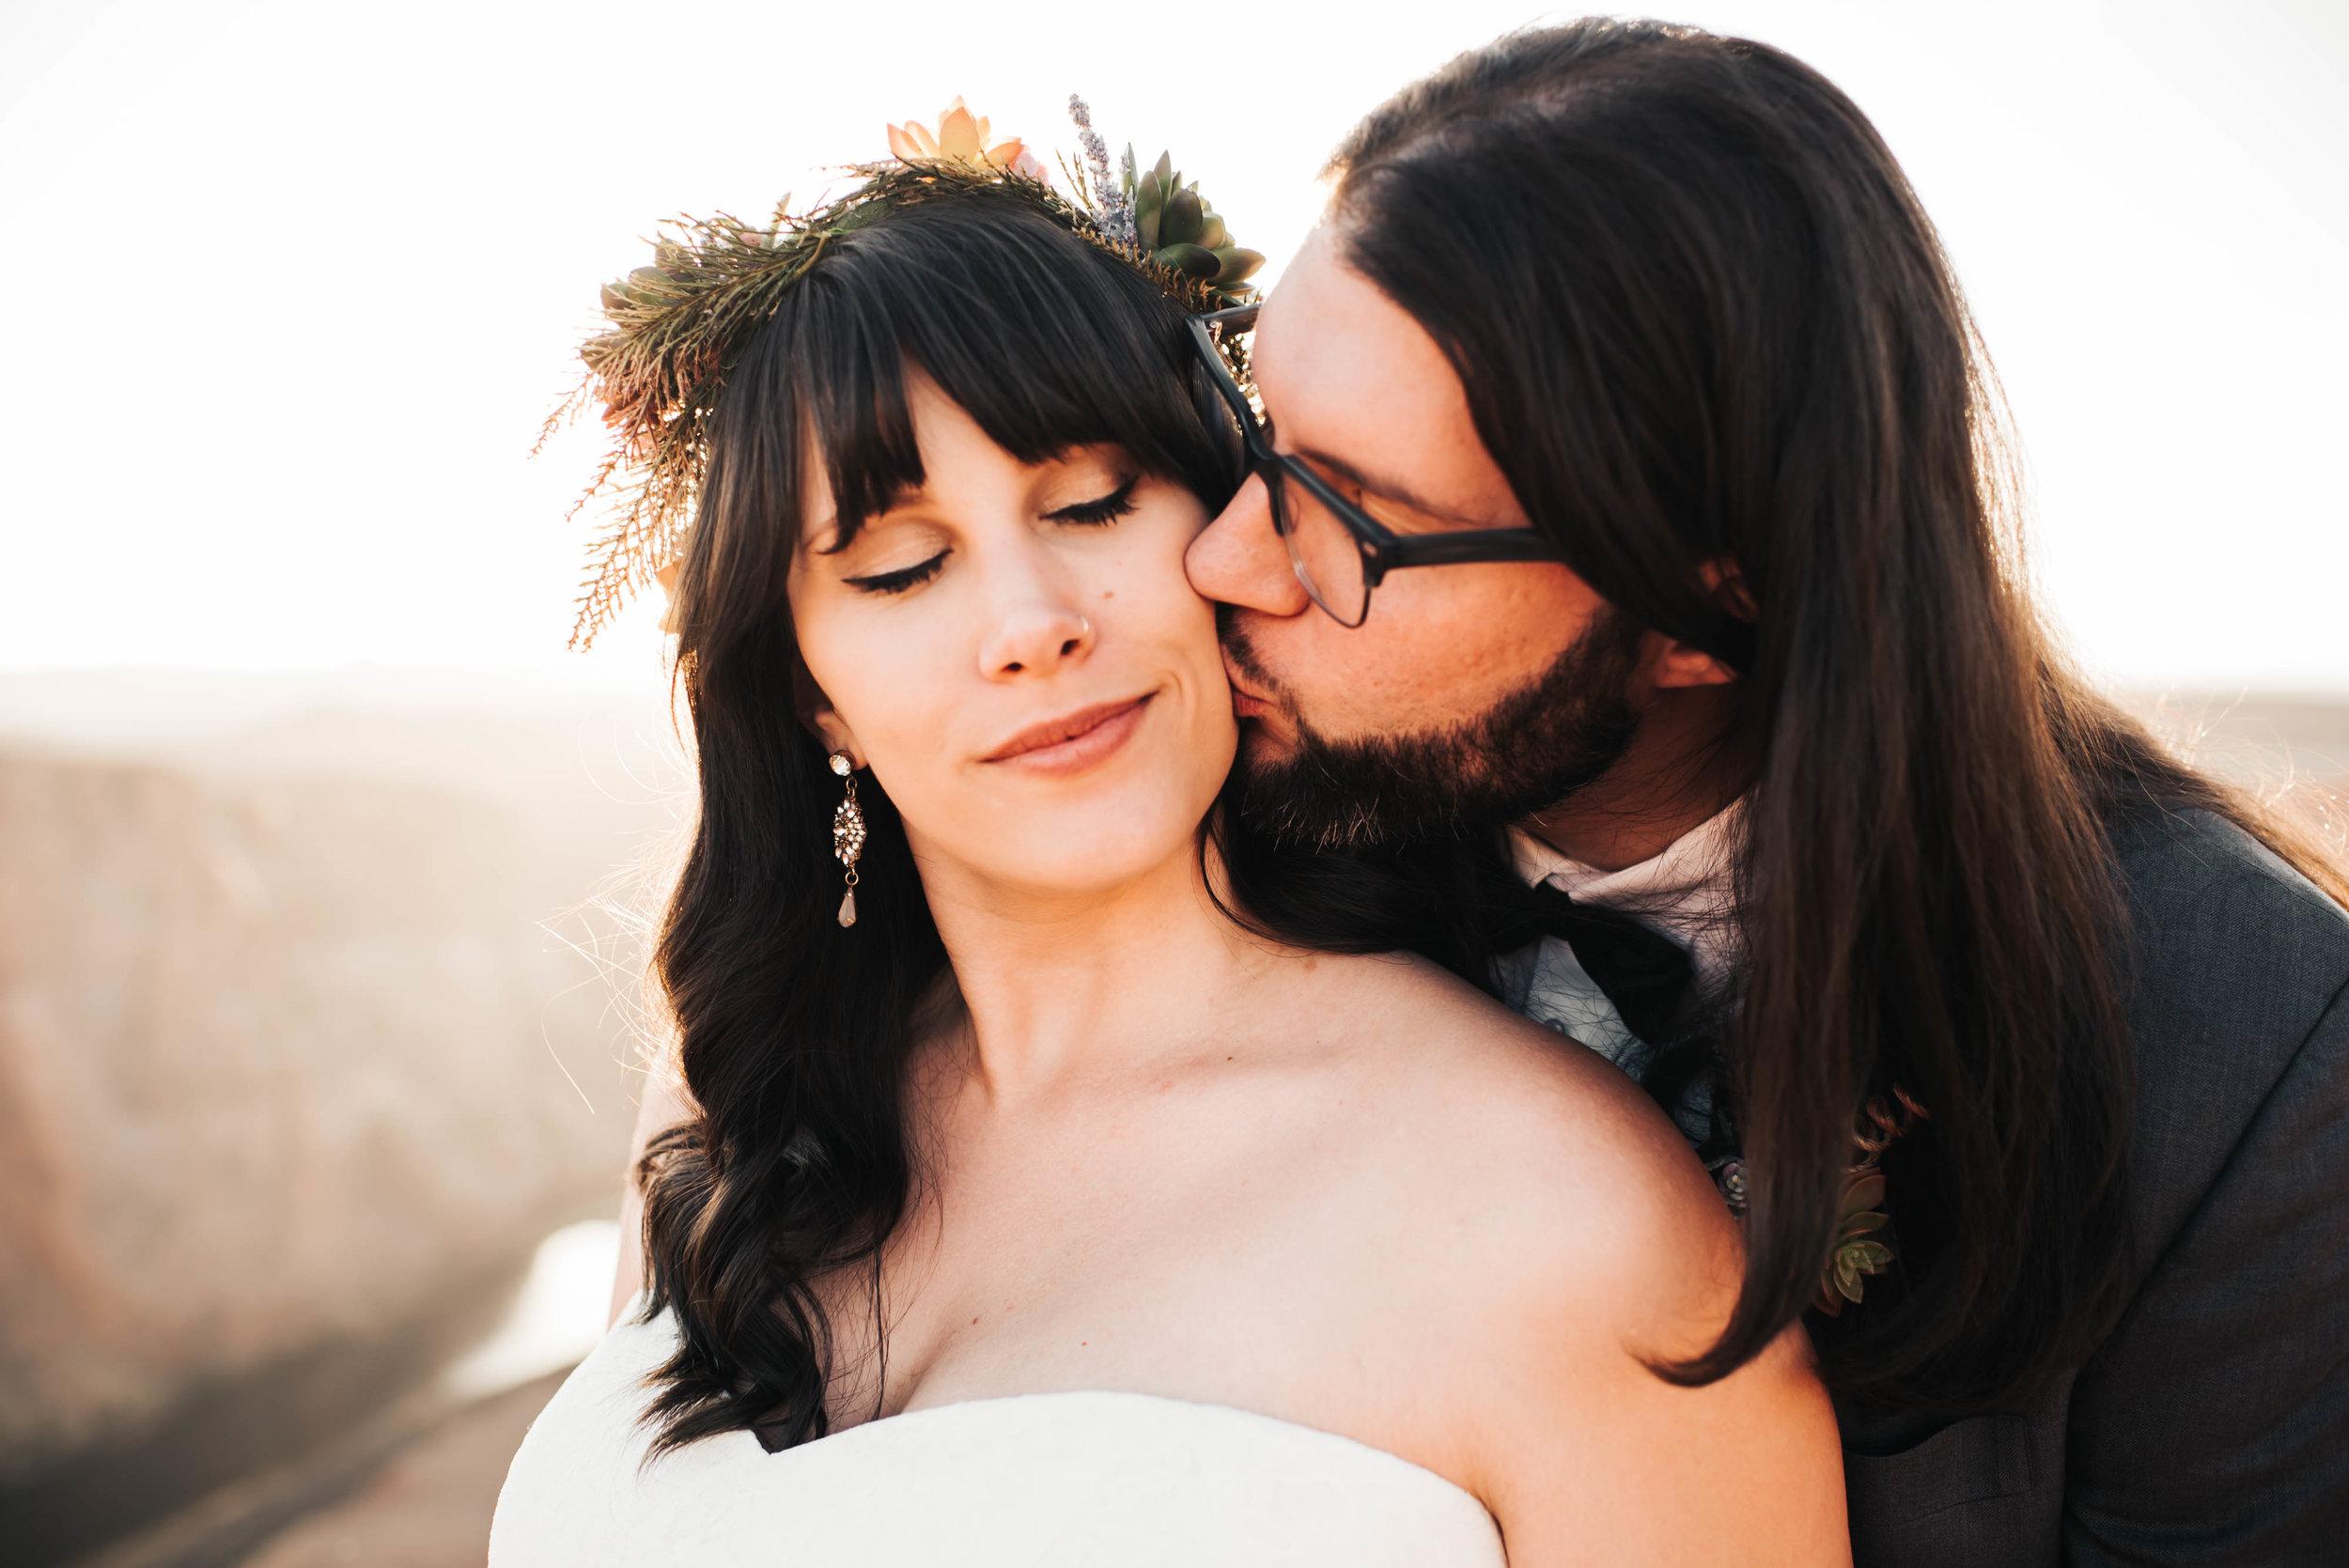 oregon arizon california utah georgia nontraditional adventure wedding elopement photographer-483.jpg